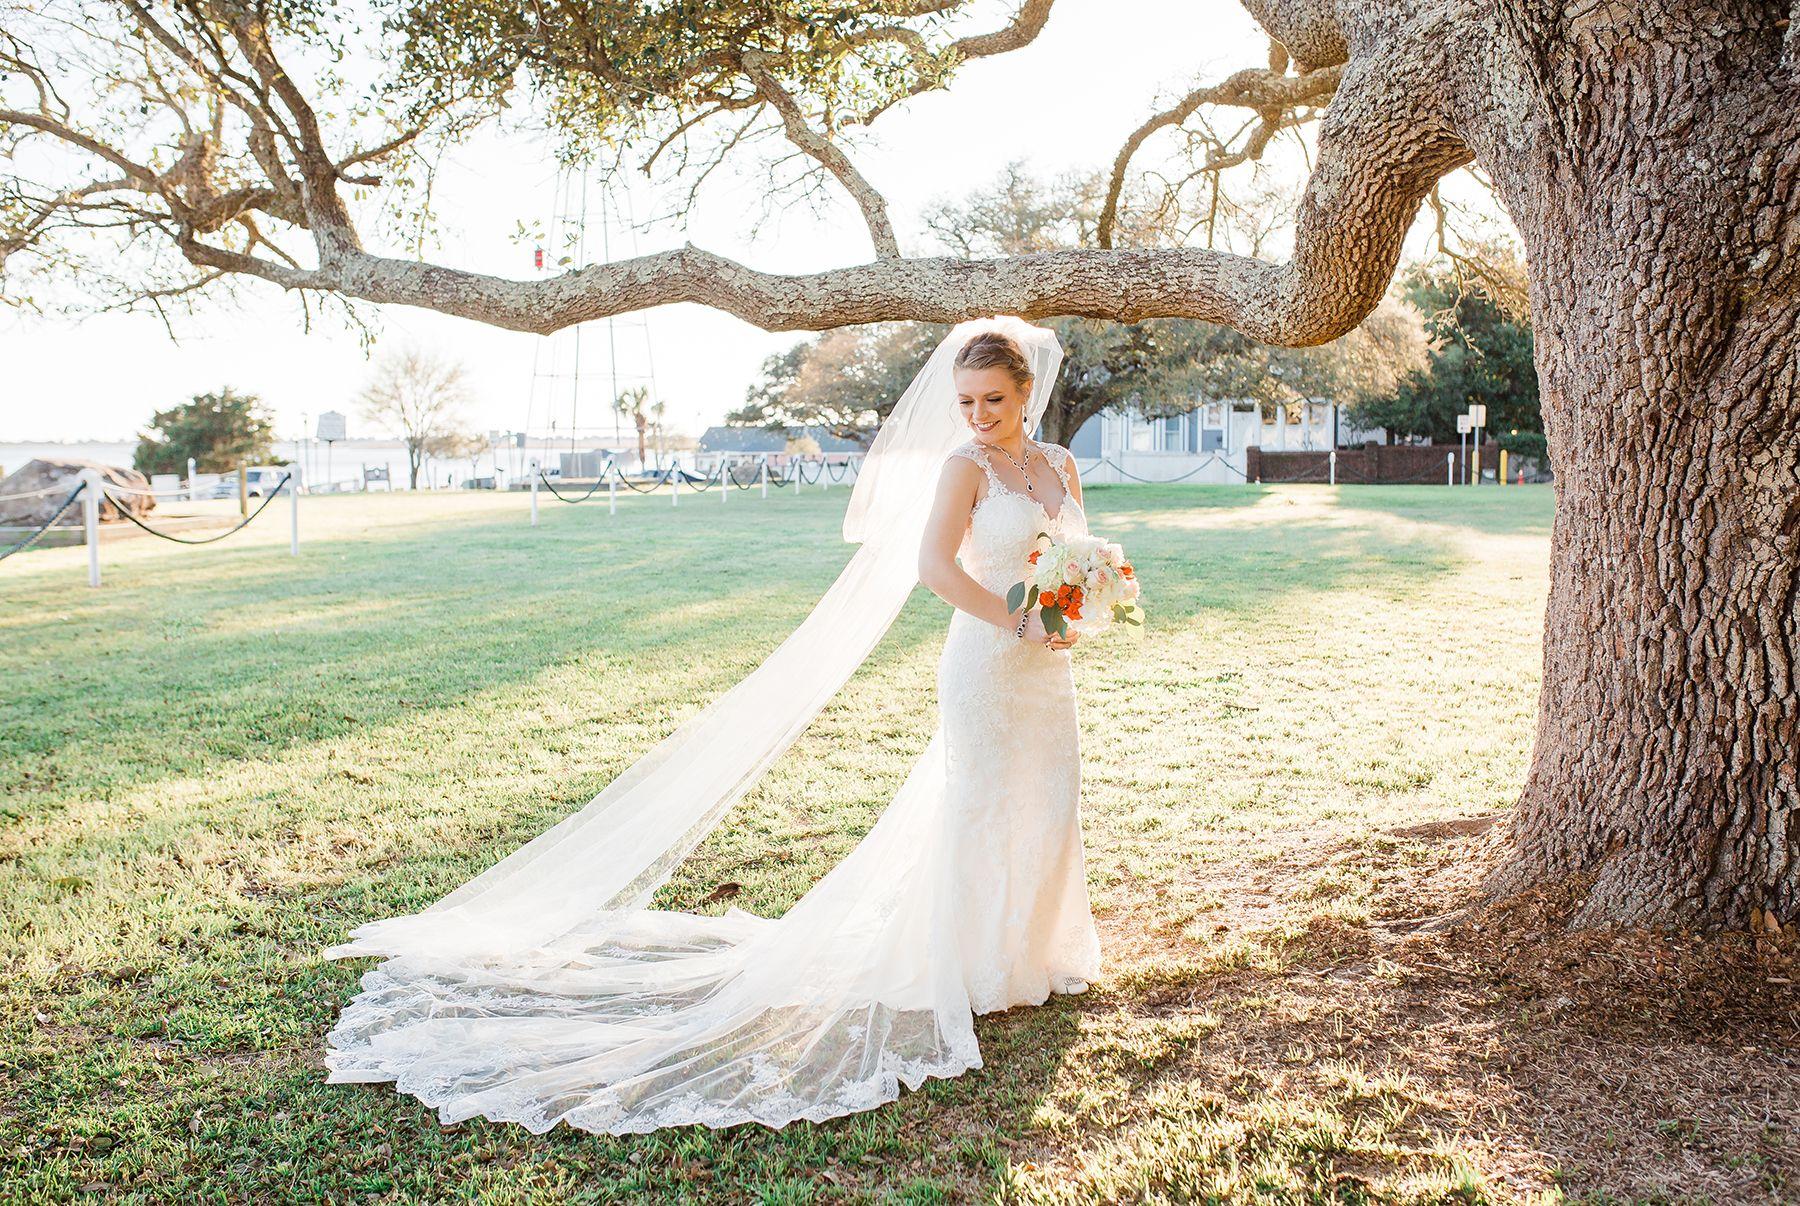 Wedding photo ideas bridal portrait ideas cathedral length veil